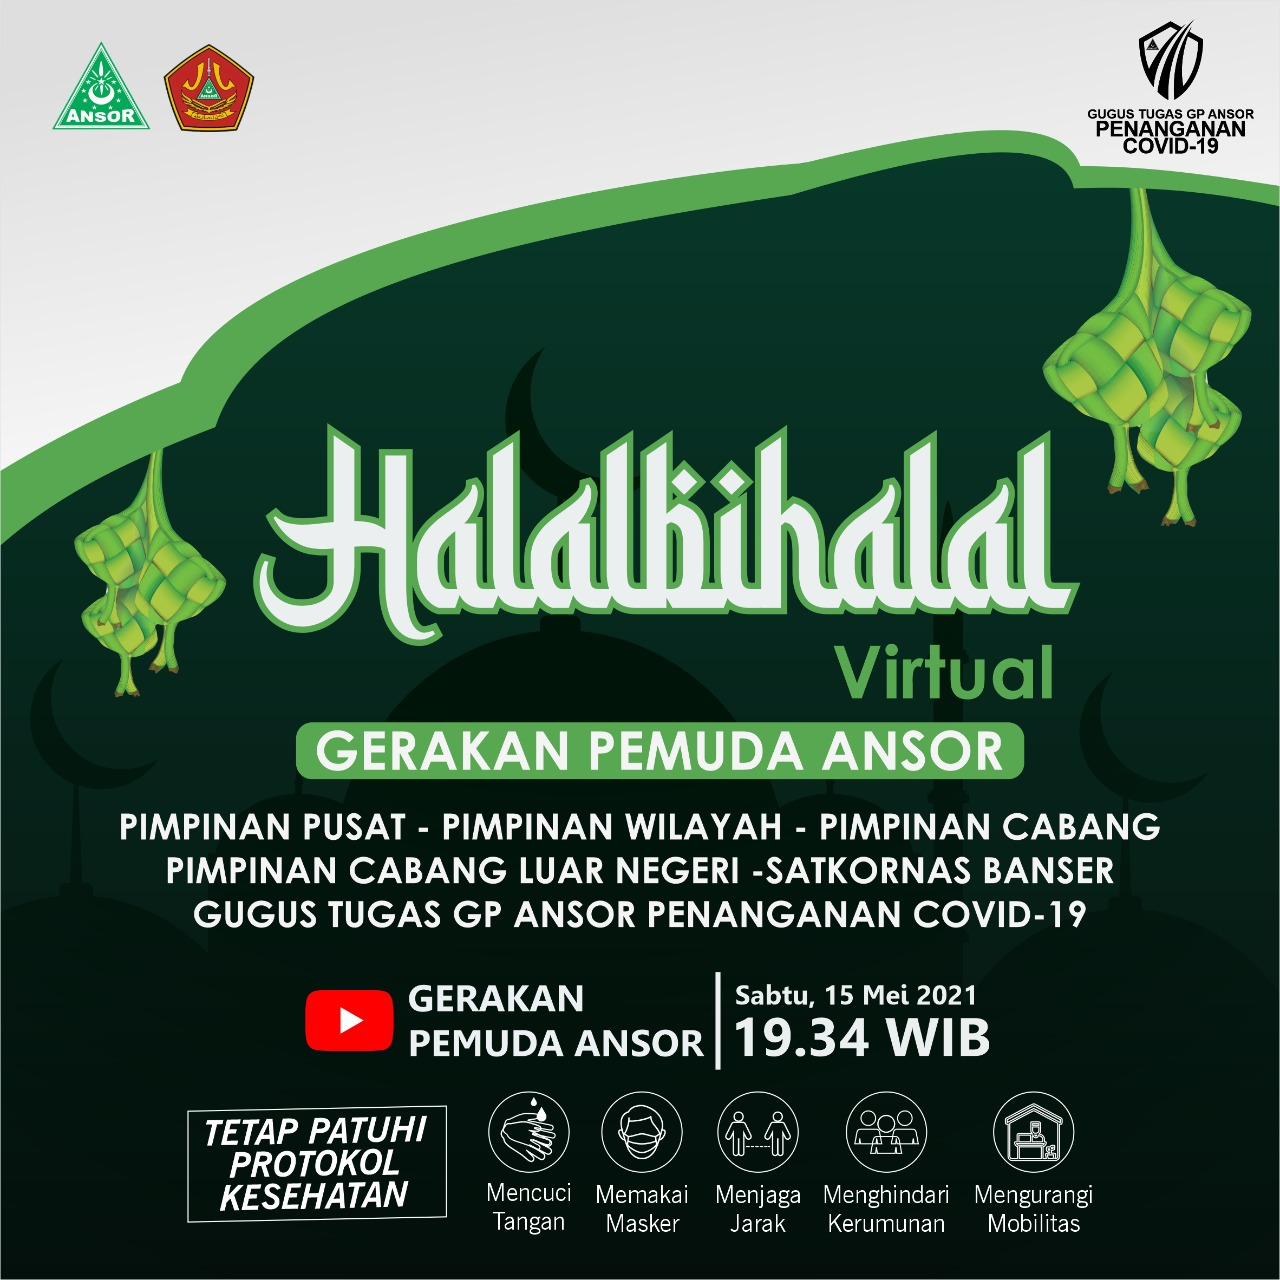 Halal Bihalal Virtual Gerakan Pemuda Ansor